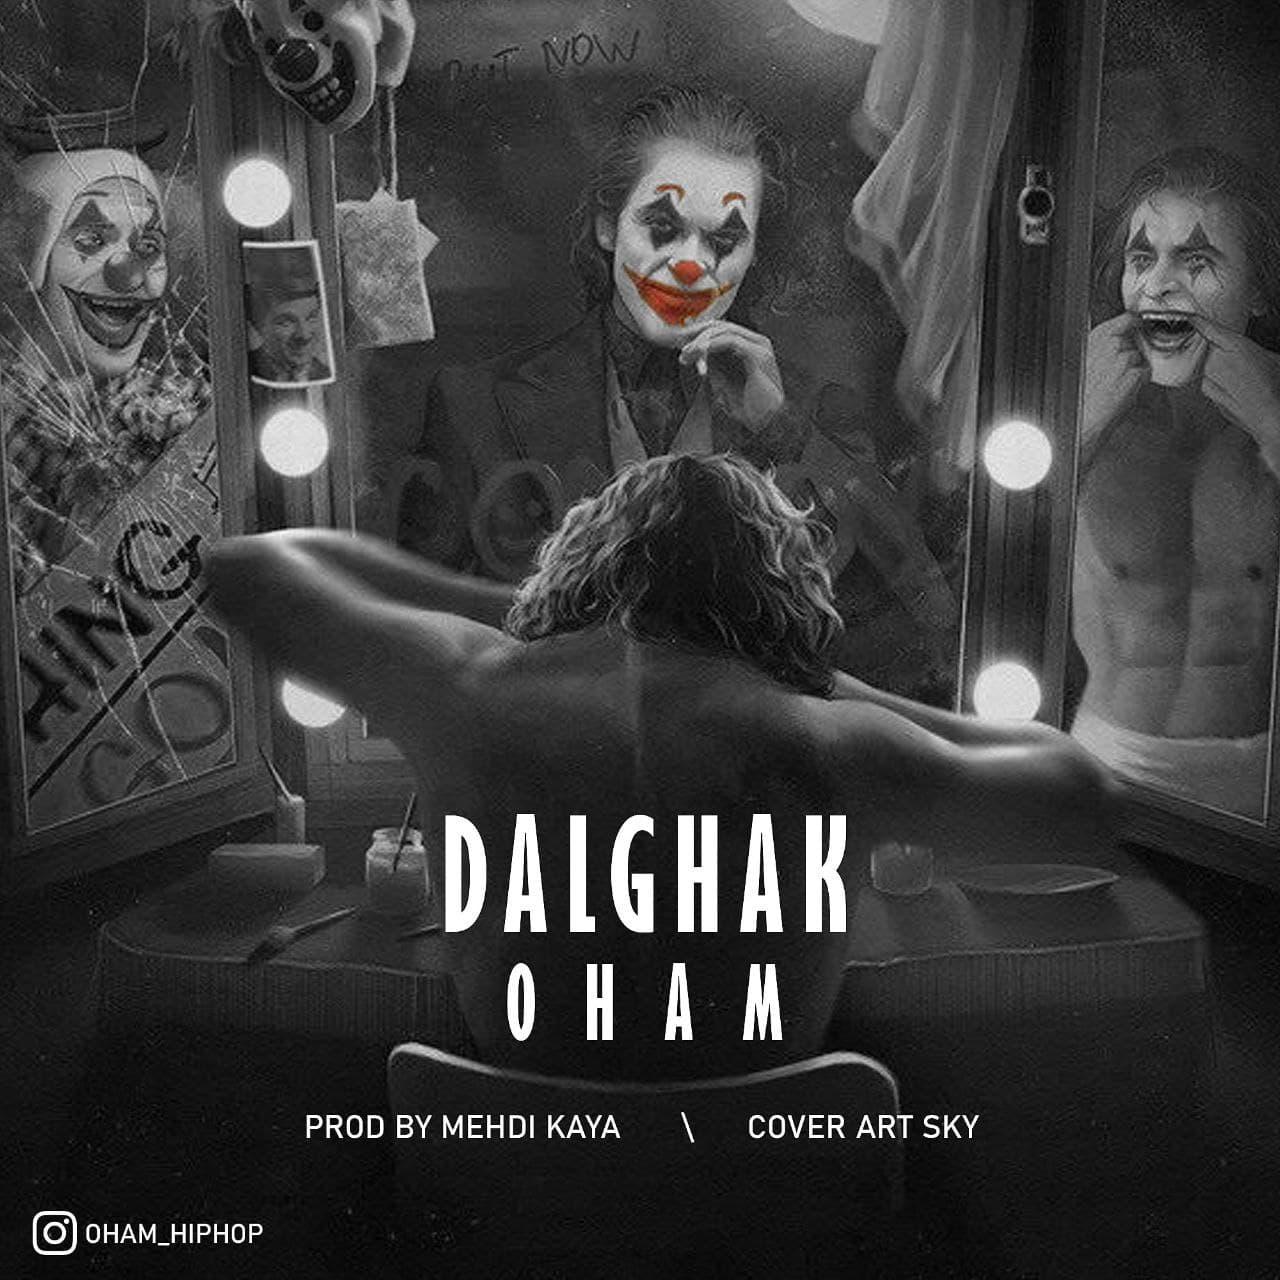 Oham – Dalghak